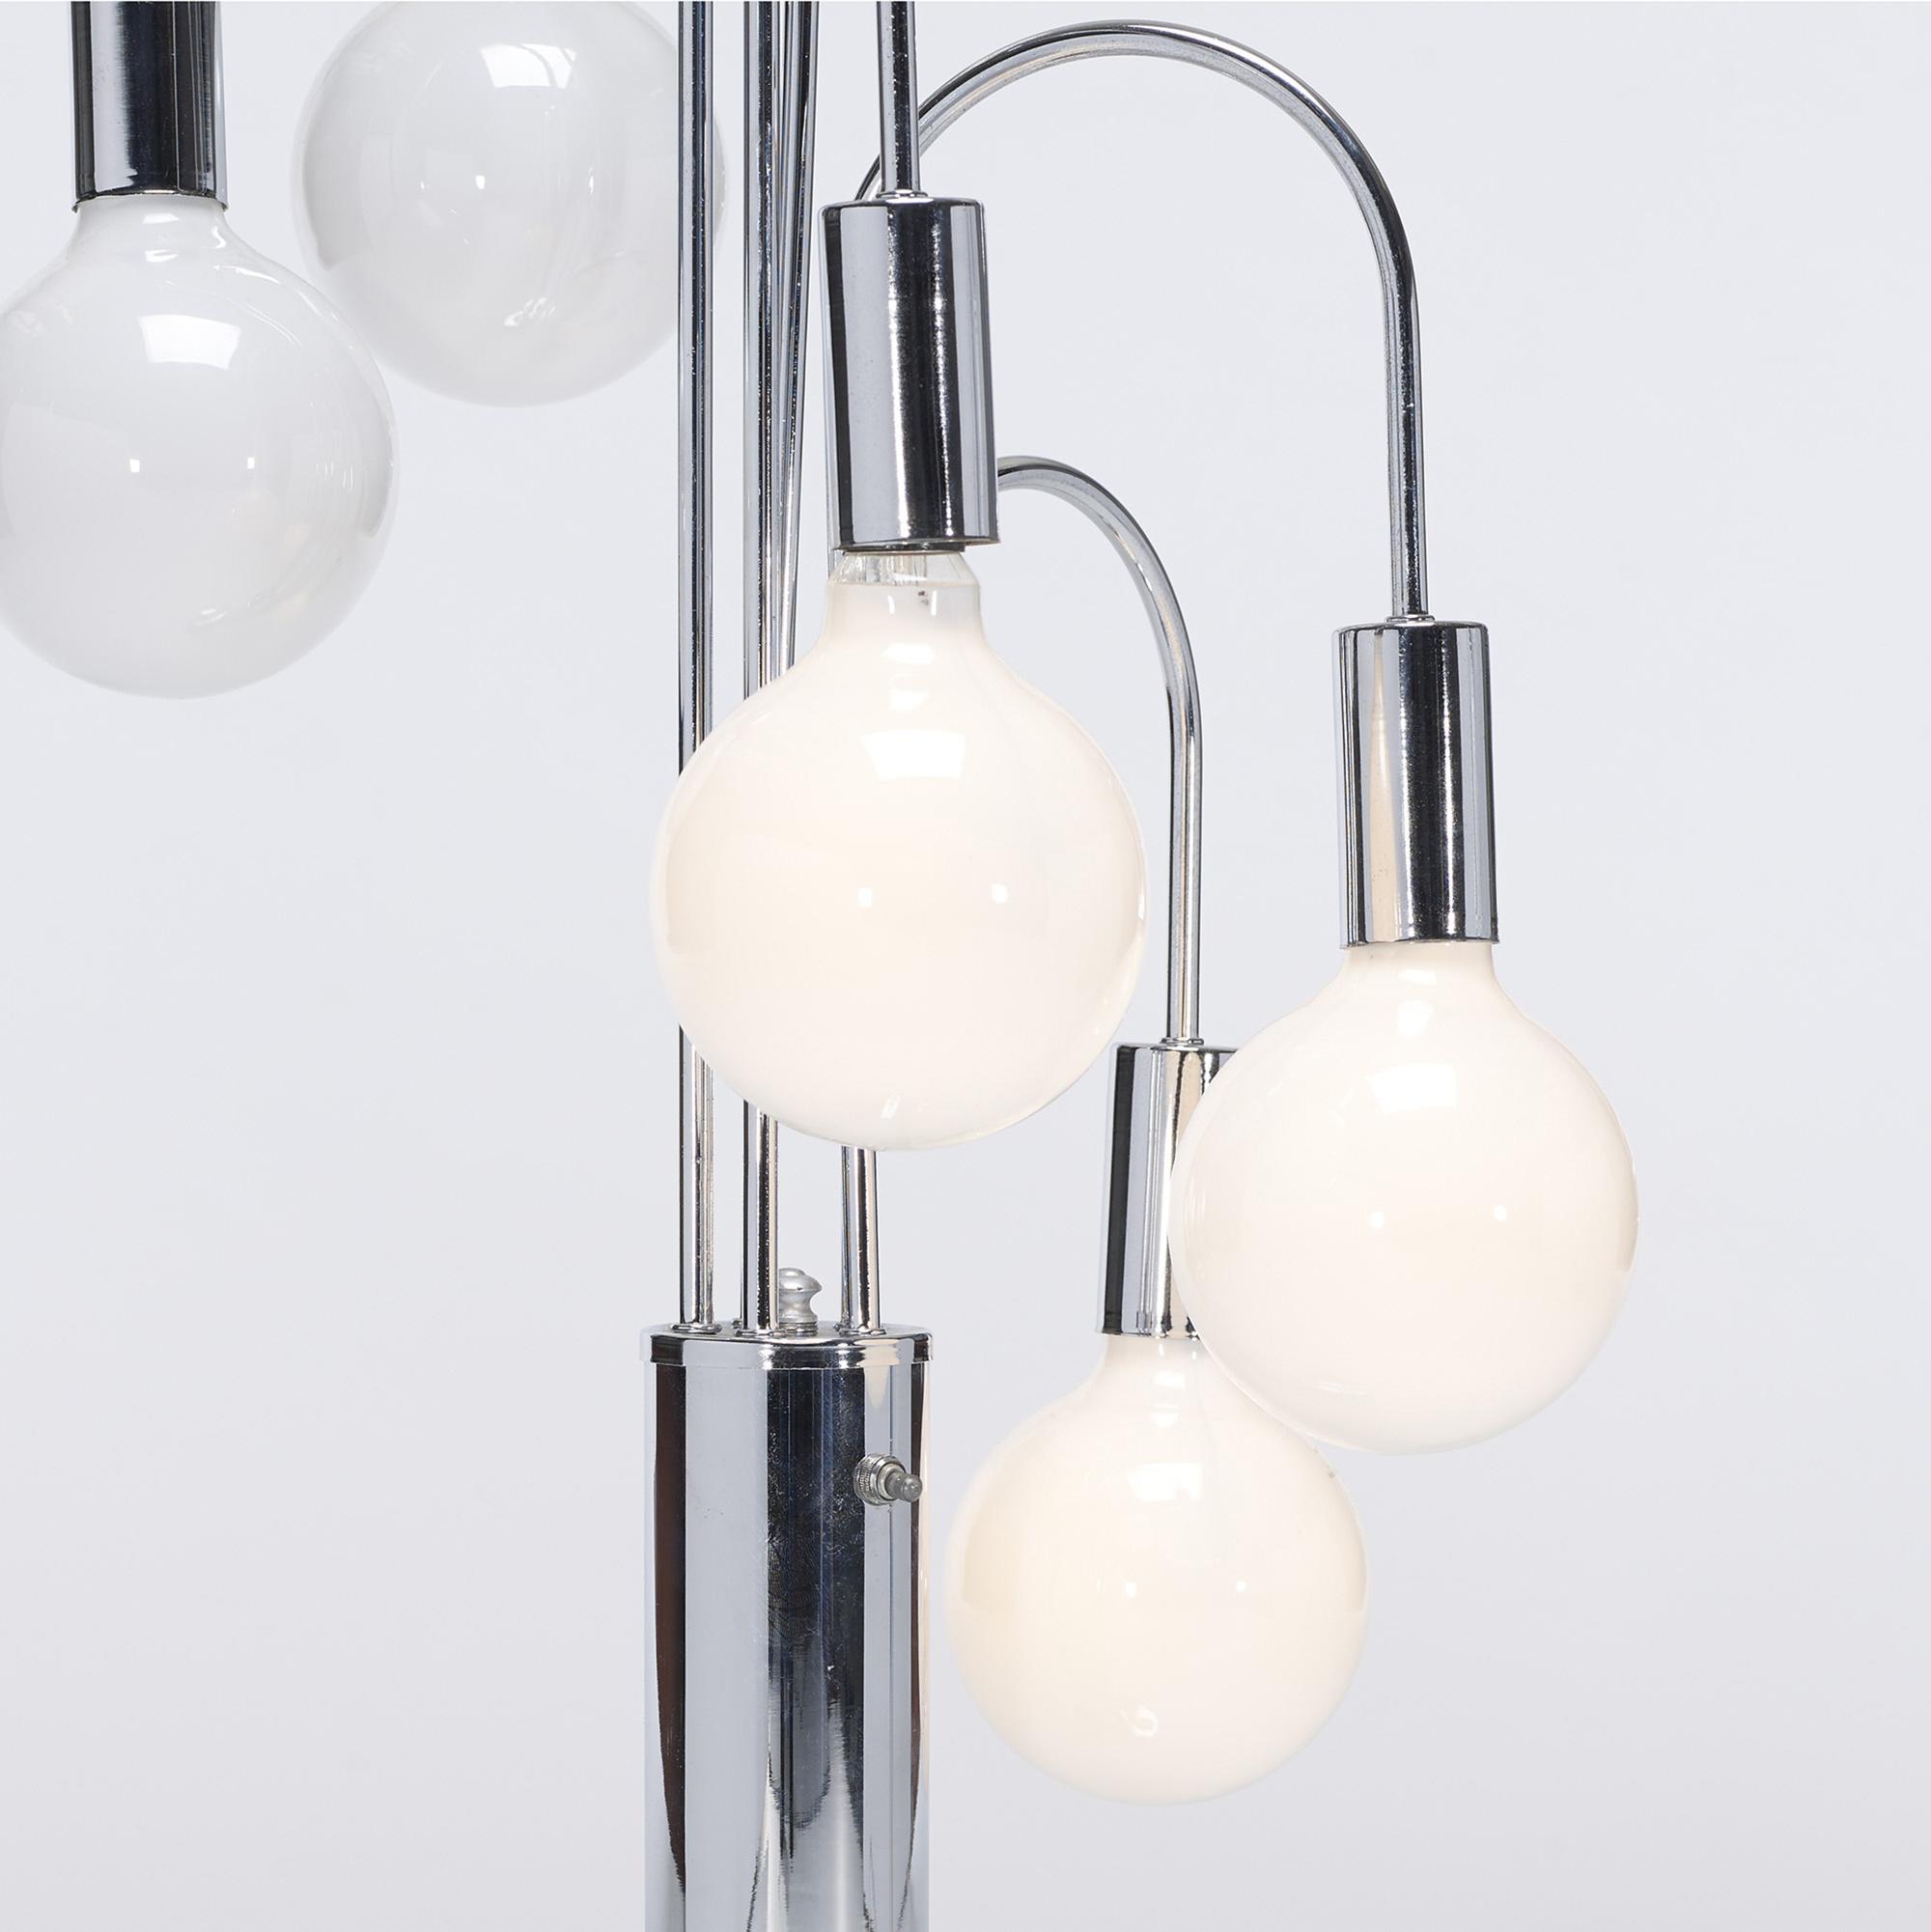 593: Modern / lamps, pair (2 of 2)